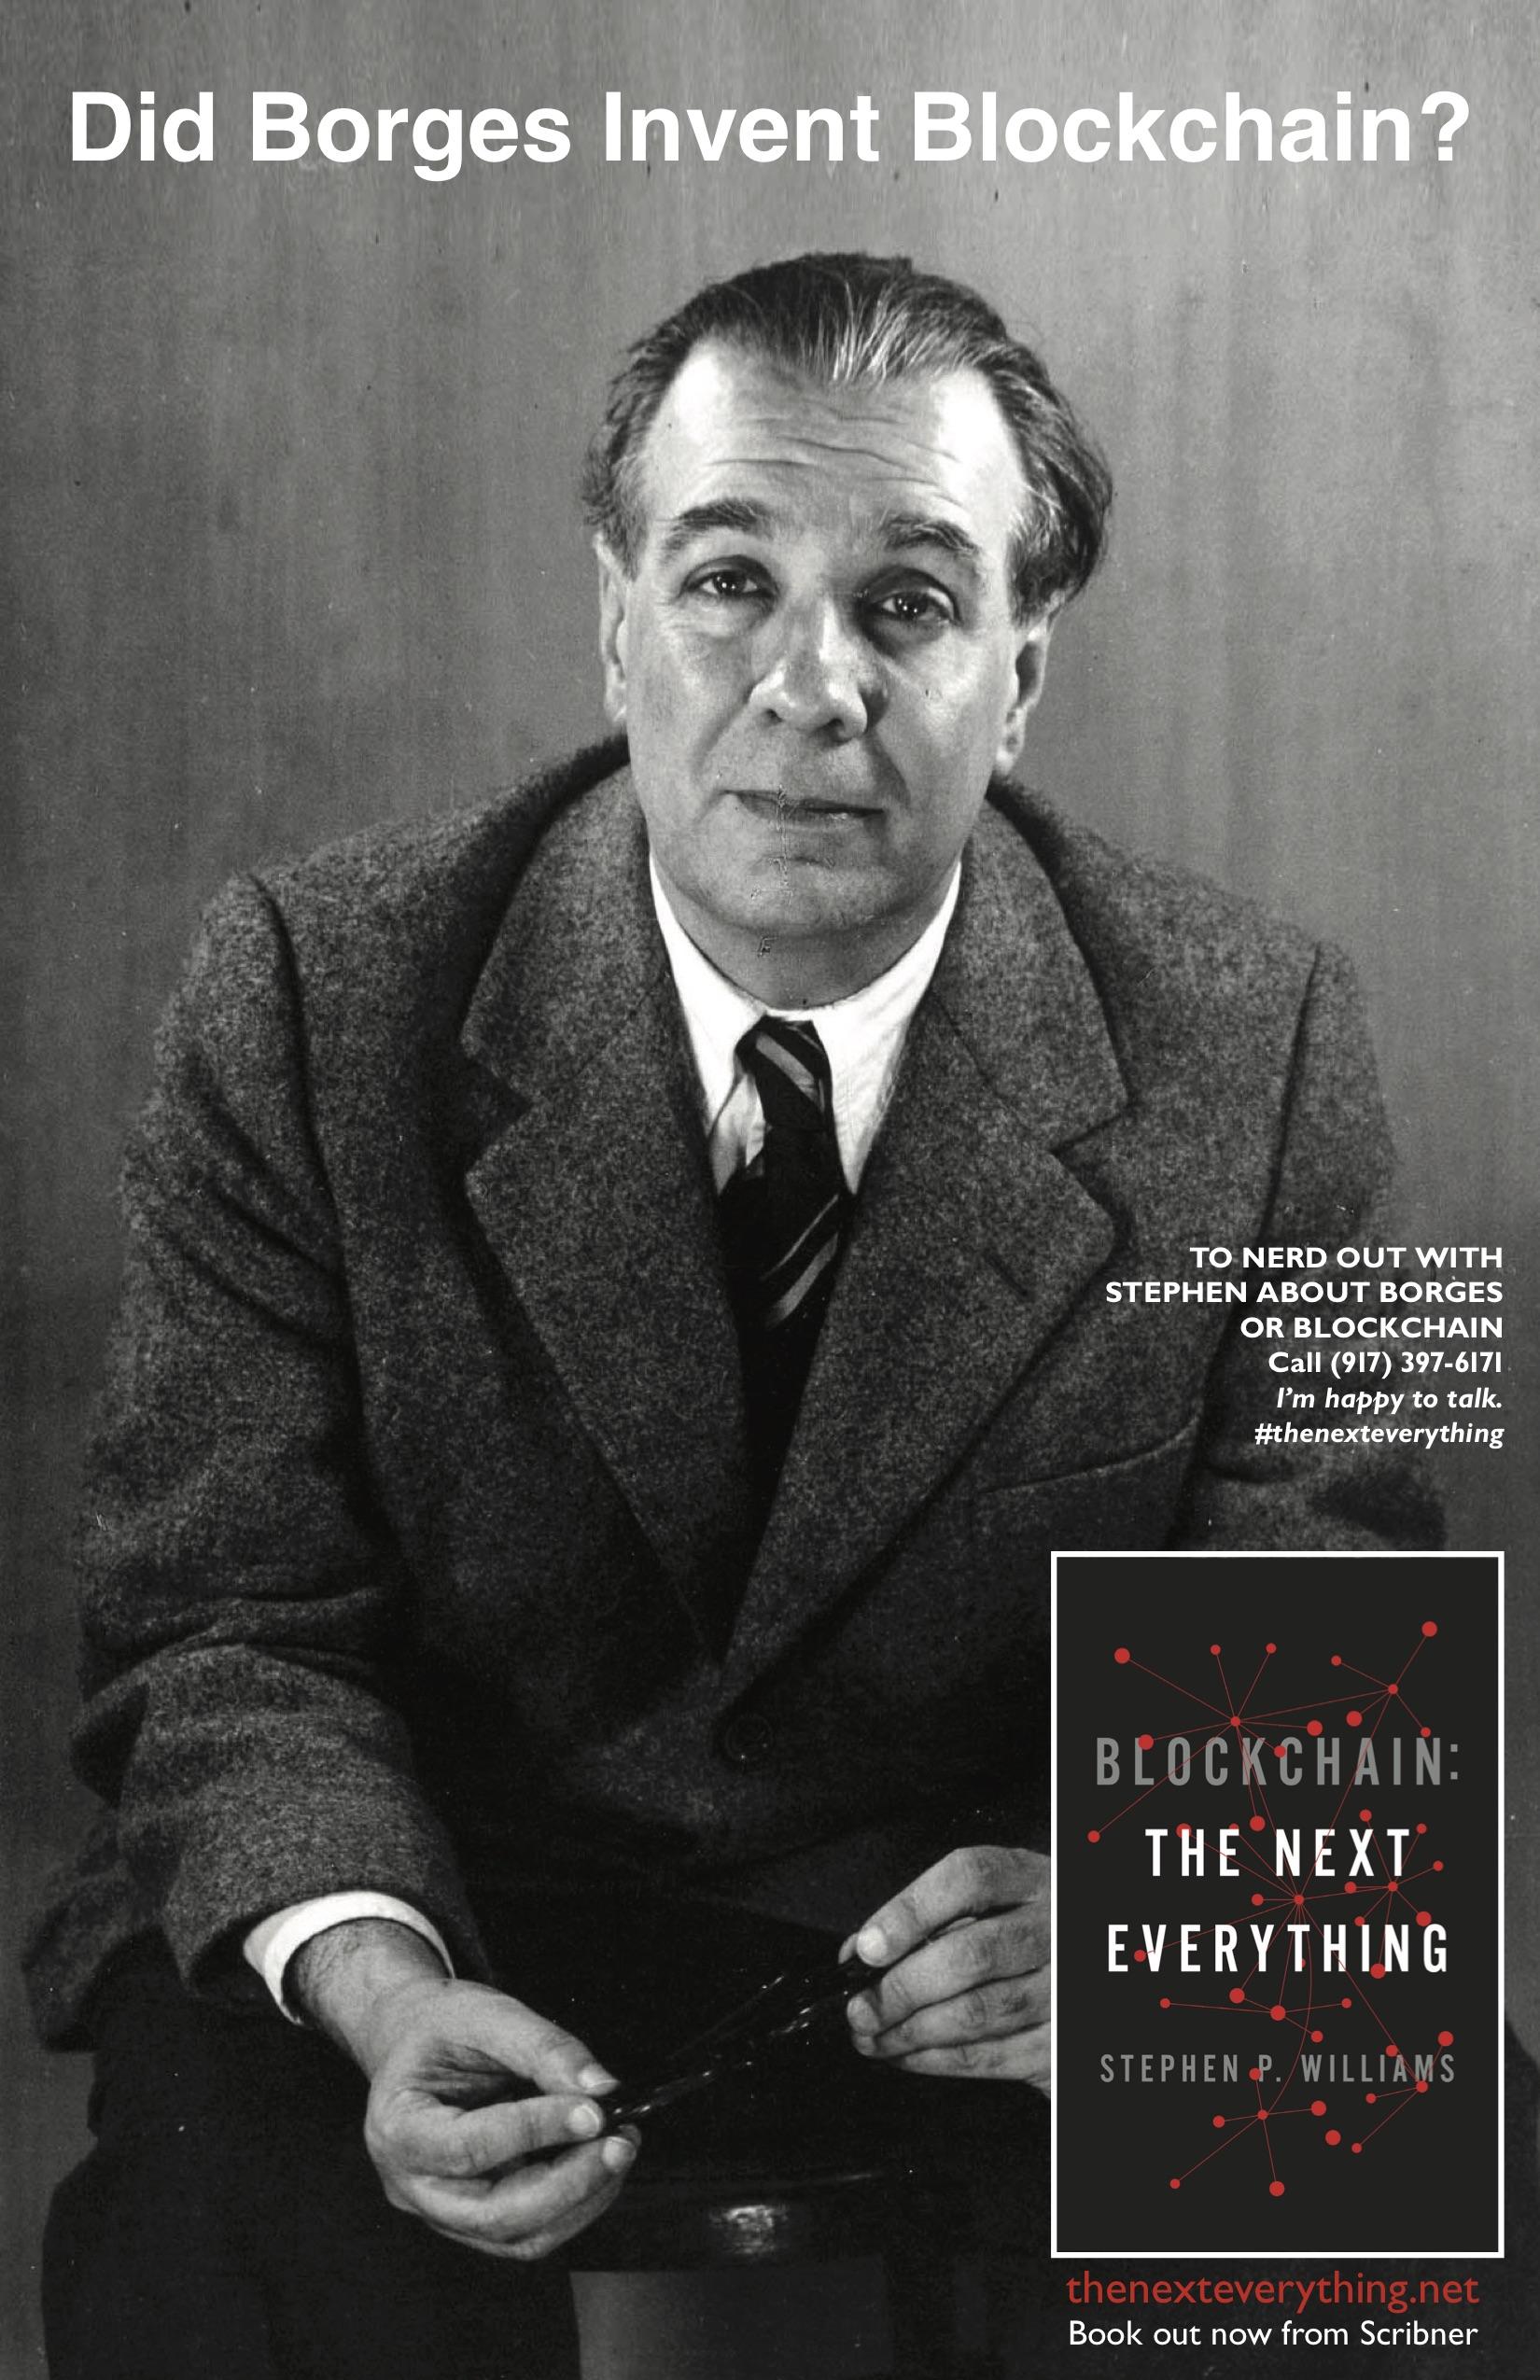 Borges Block Chain Poster 8x10  jpeg.jpg